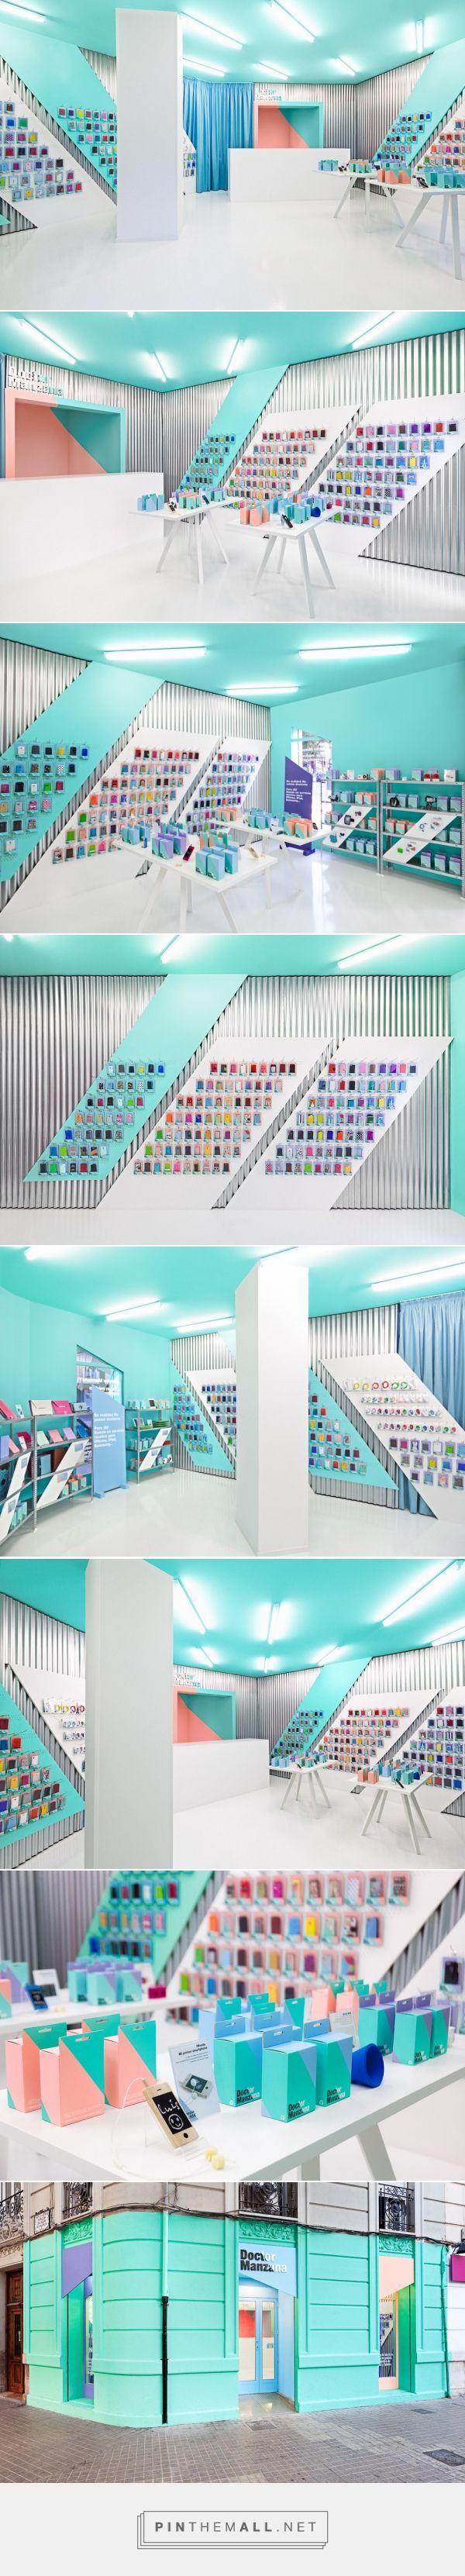 Doctor Manzana - Phone Store - Interior Design - by Masquespacio